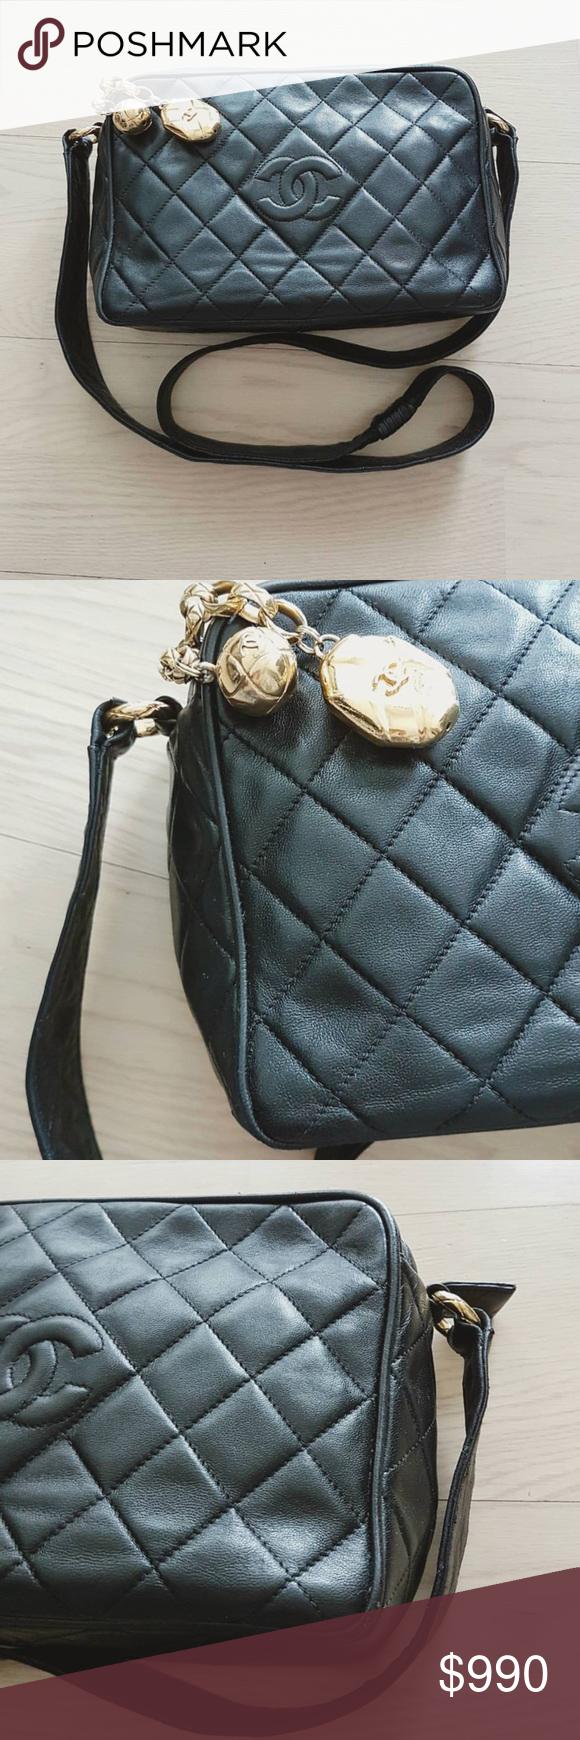 7b0129923900 Bag · ❤️FLASH SALE Chanel Crossbody Authentic vintage ...